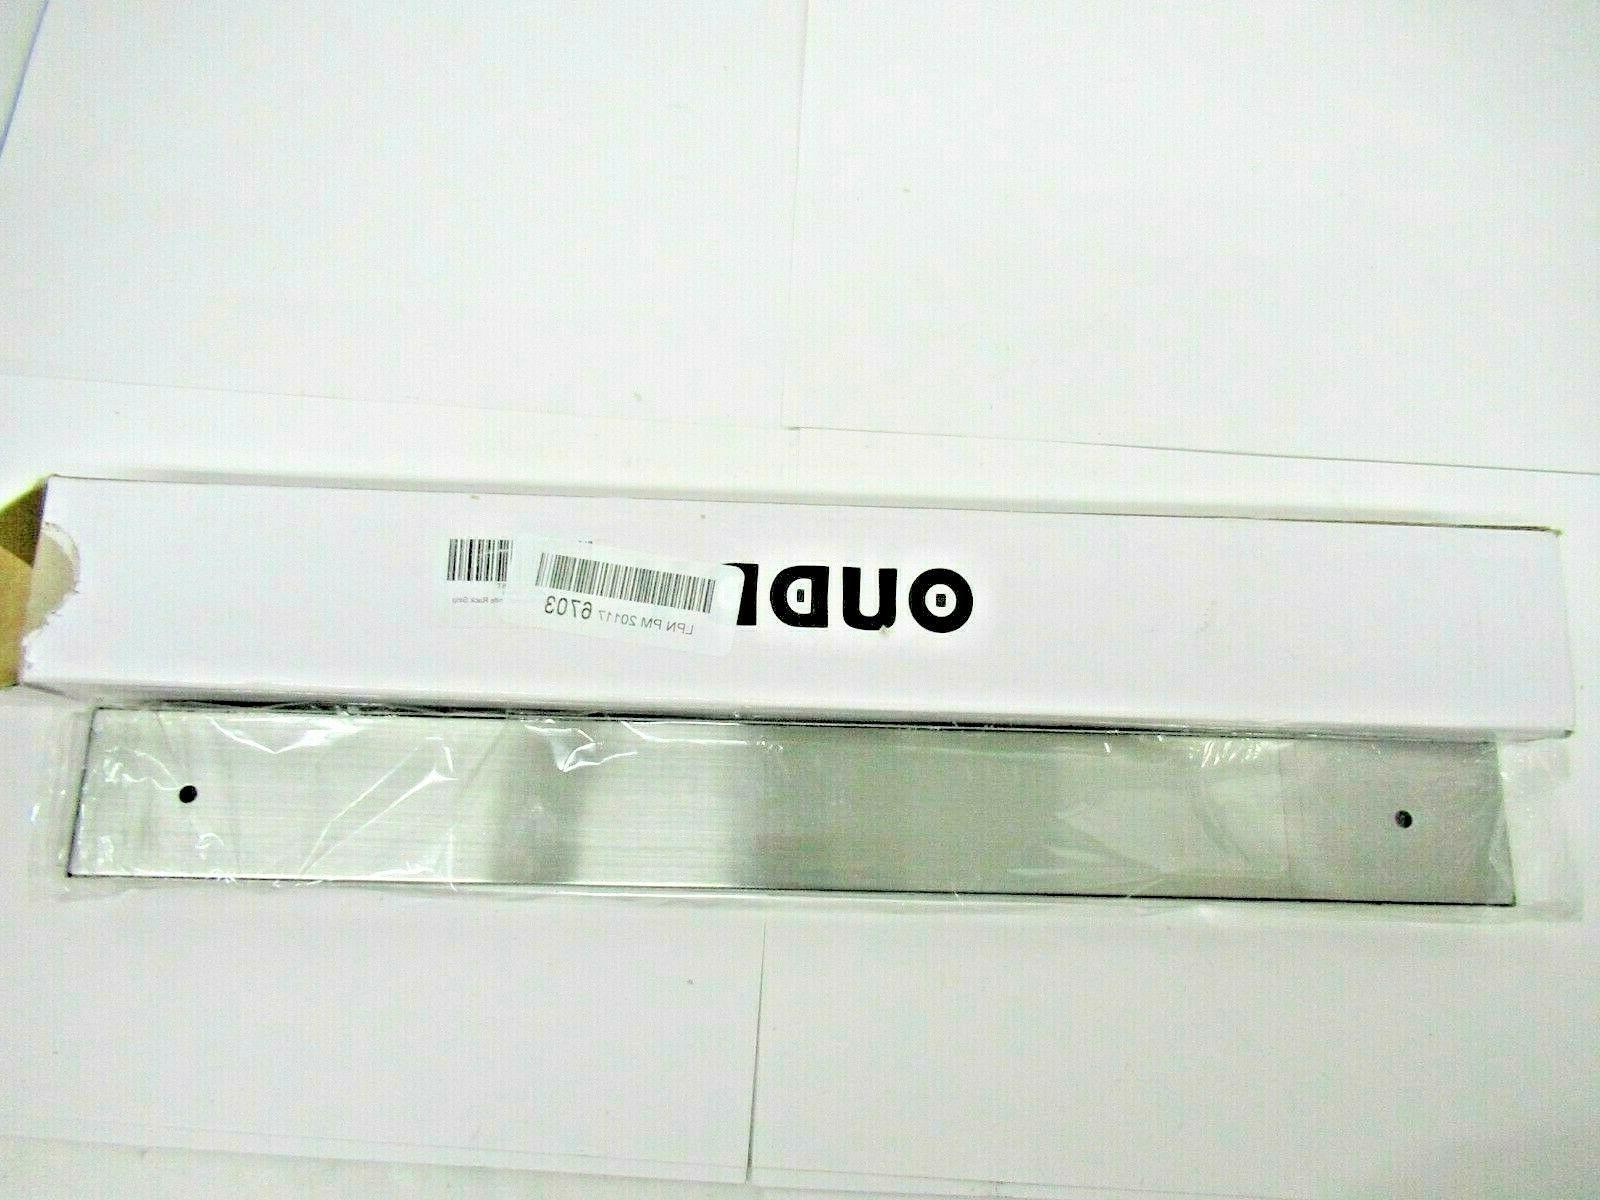 Ouddy 16 Inch Magnetic Knife Holder, Stainless Steel Magneti